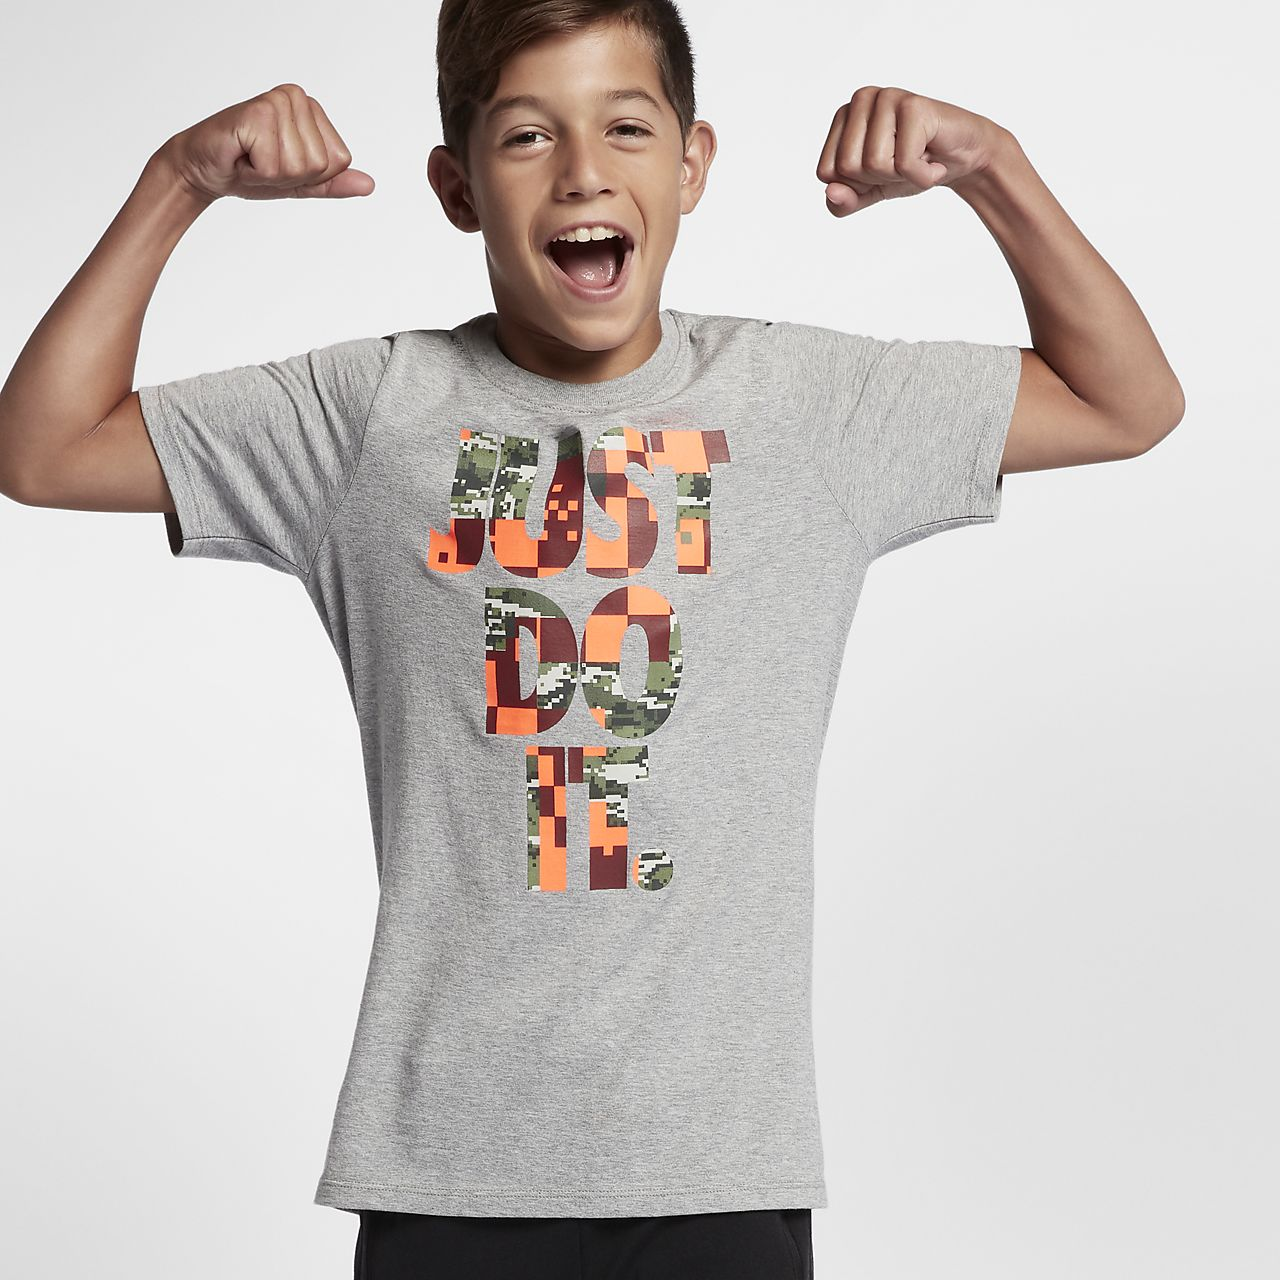 nike sportswear quotjust do itquot camiseta ni241o nikecom es